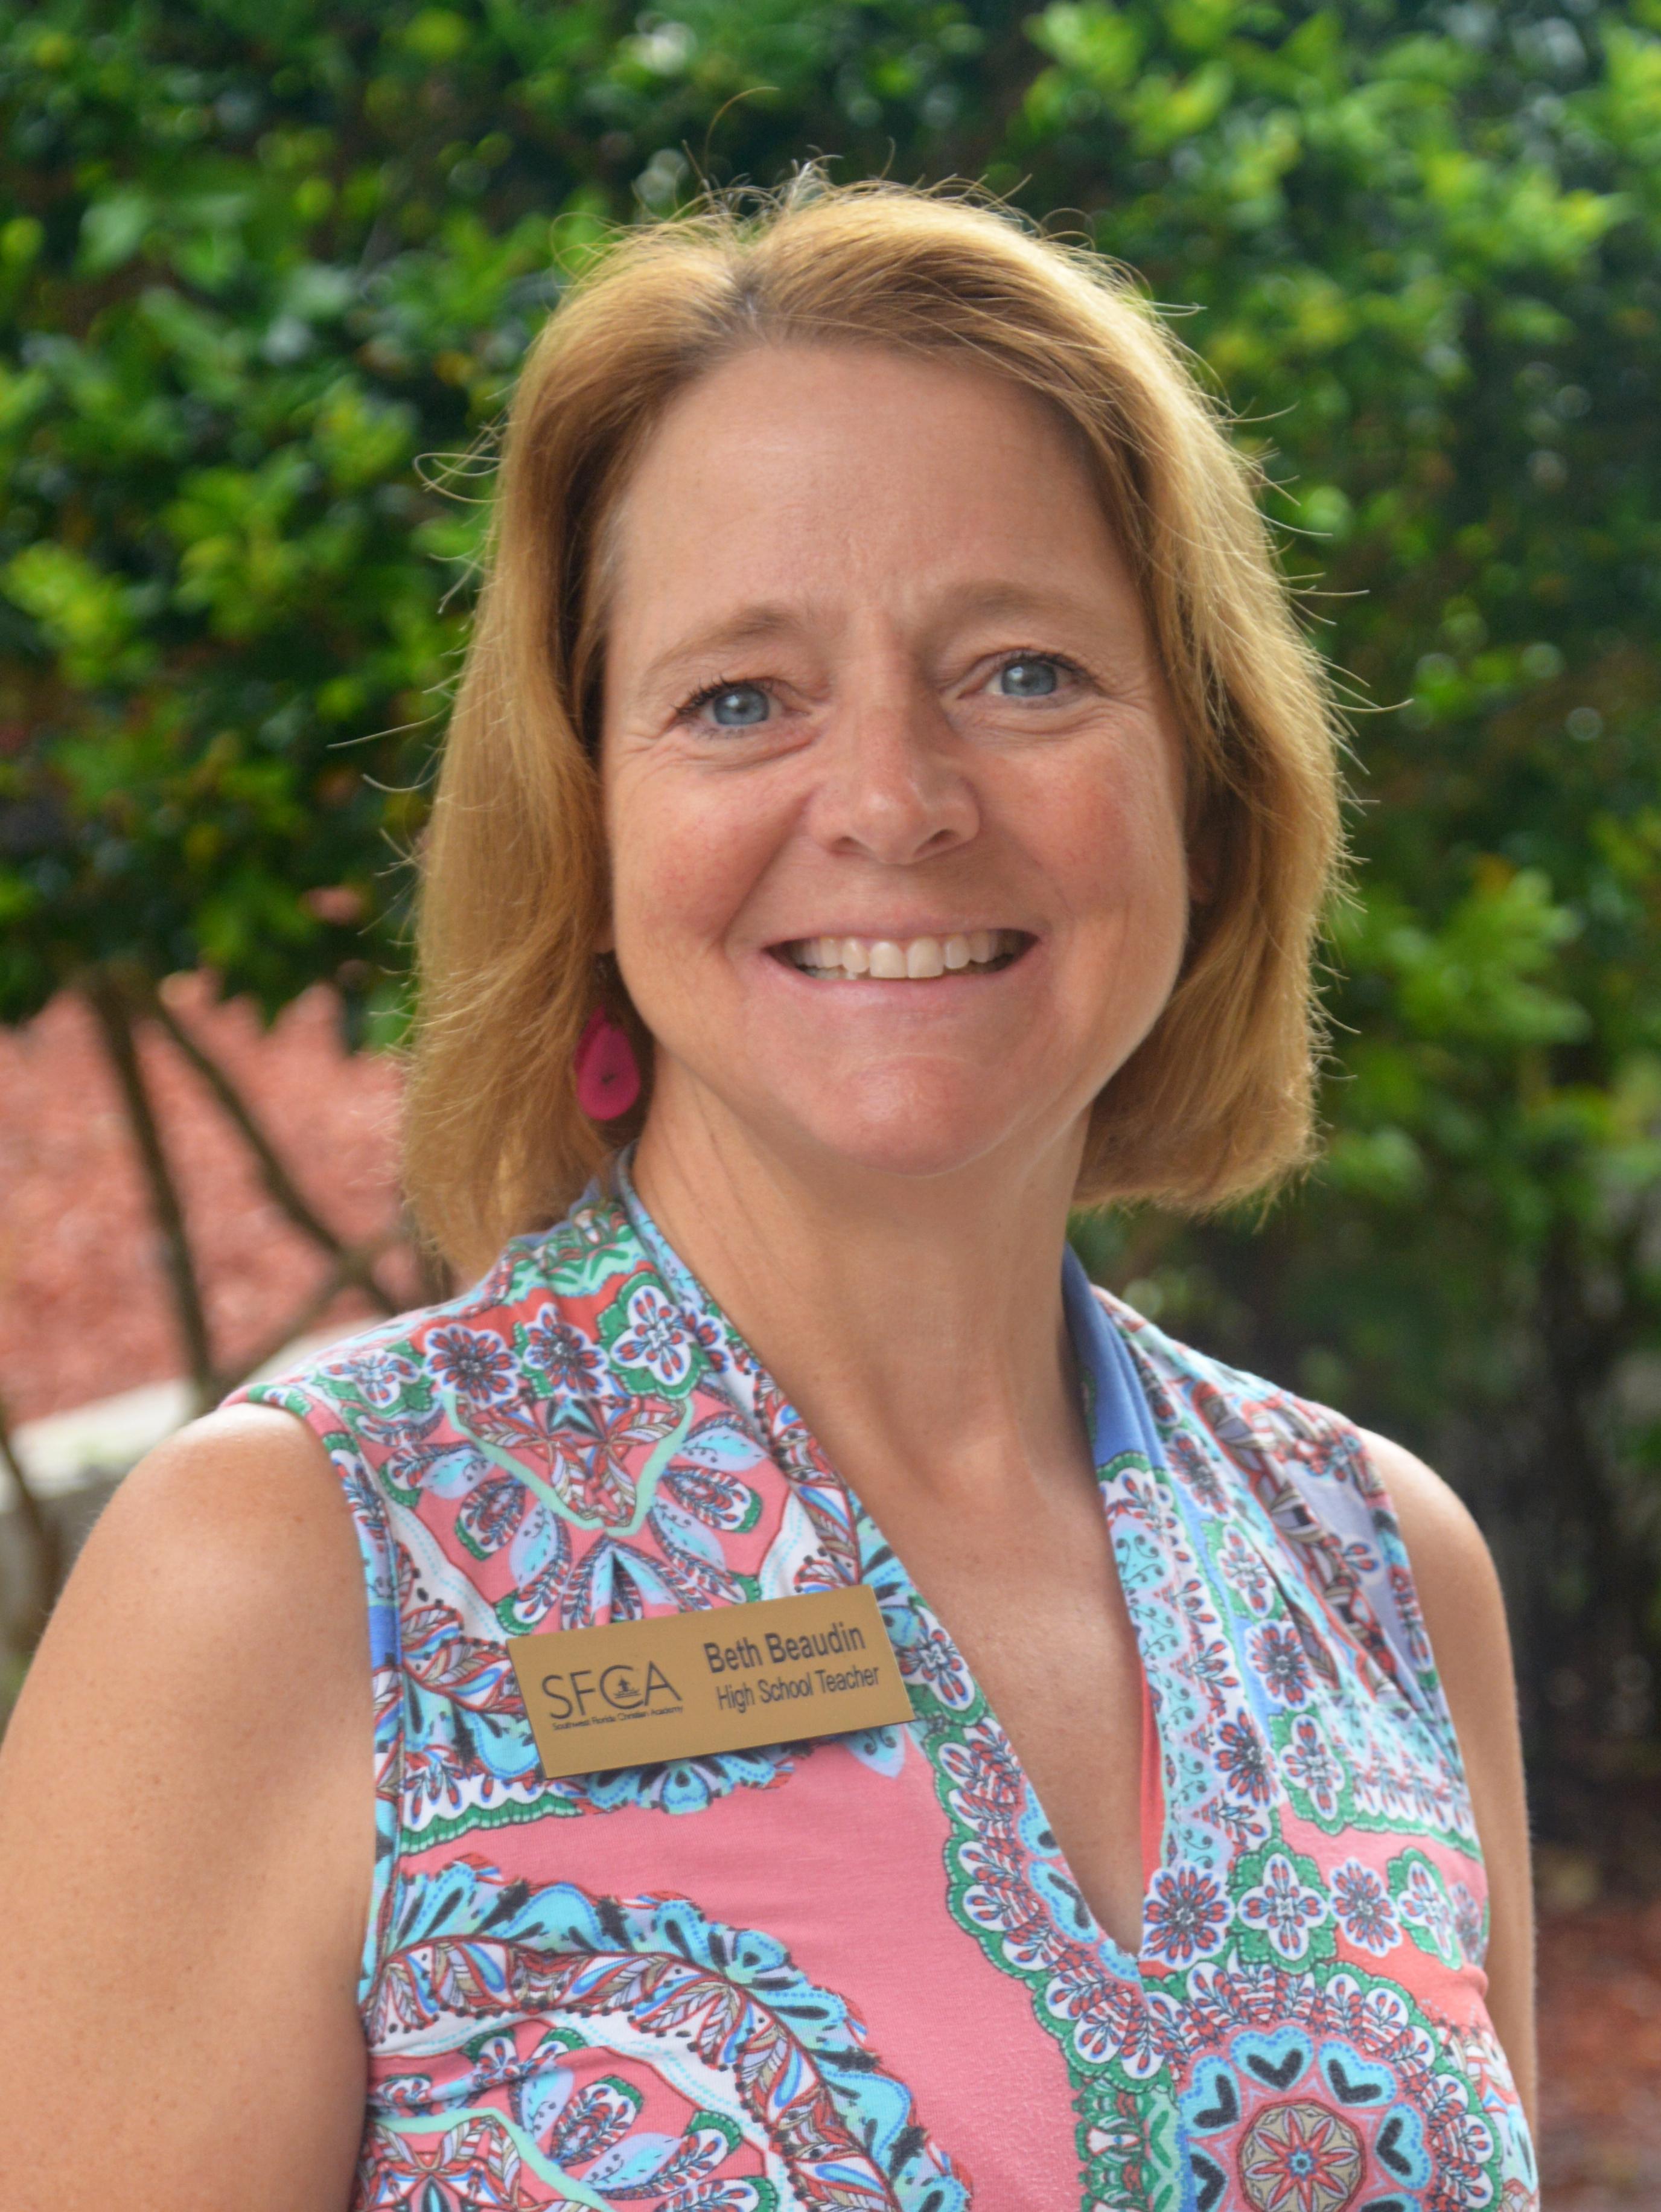 Beth Beaudin